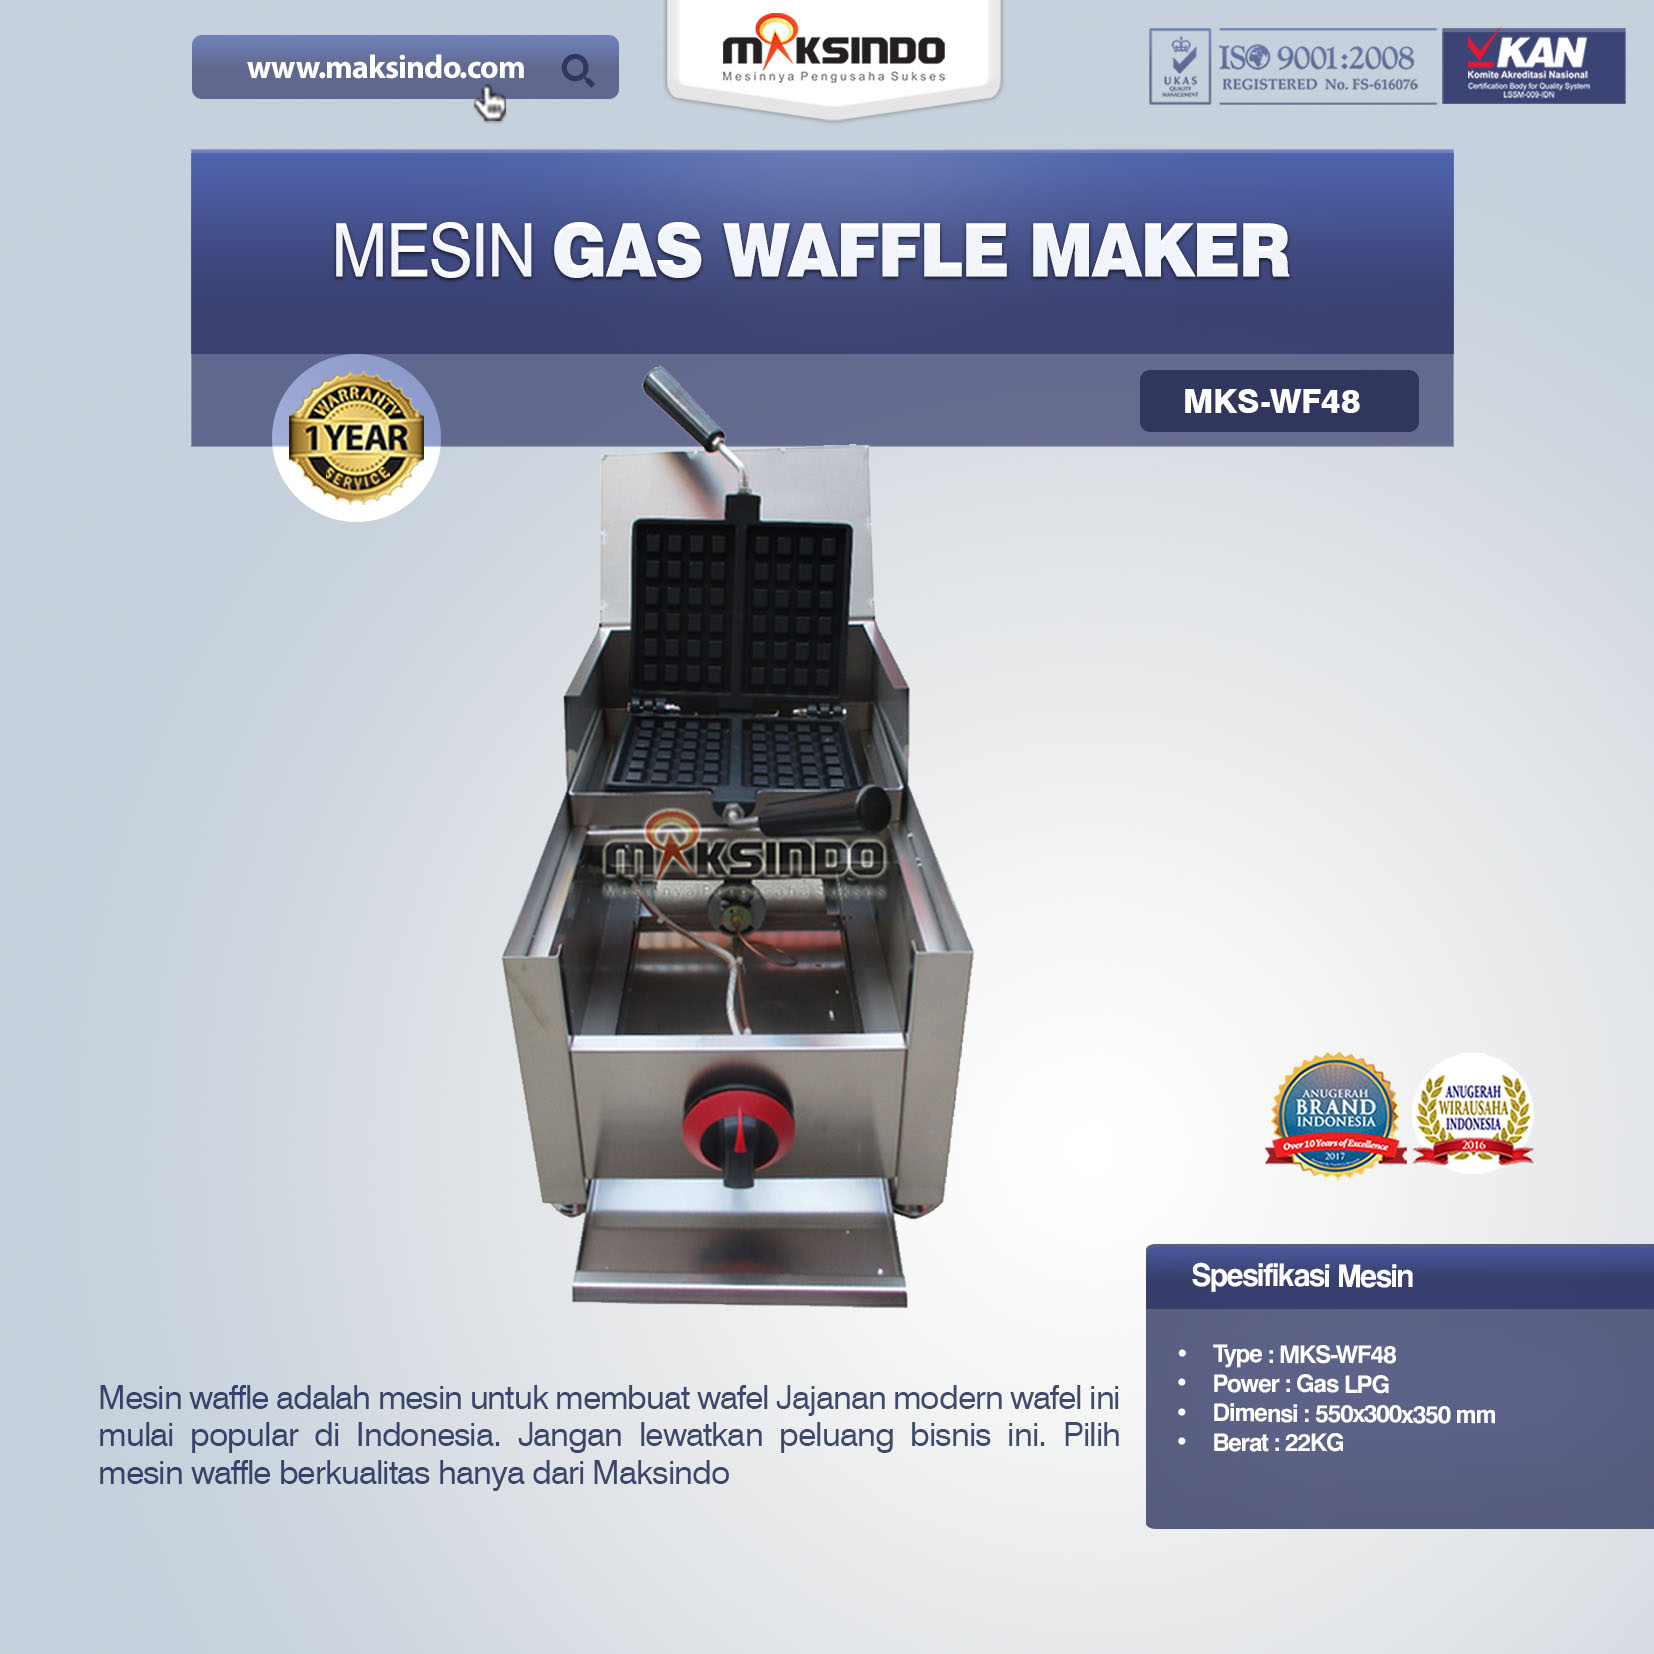 Jual Mesin Gas Waffle Maker MKS-WF48 di Bandung